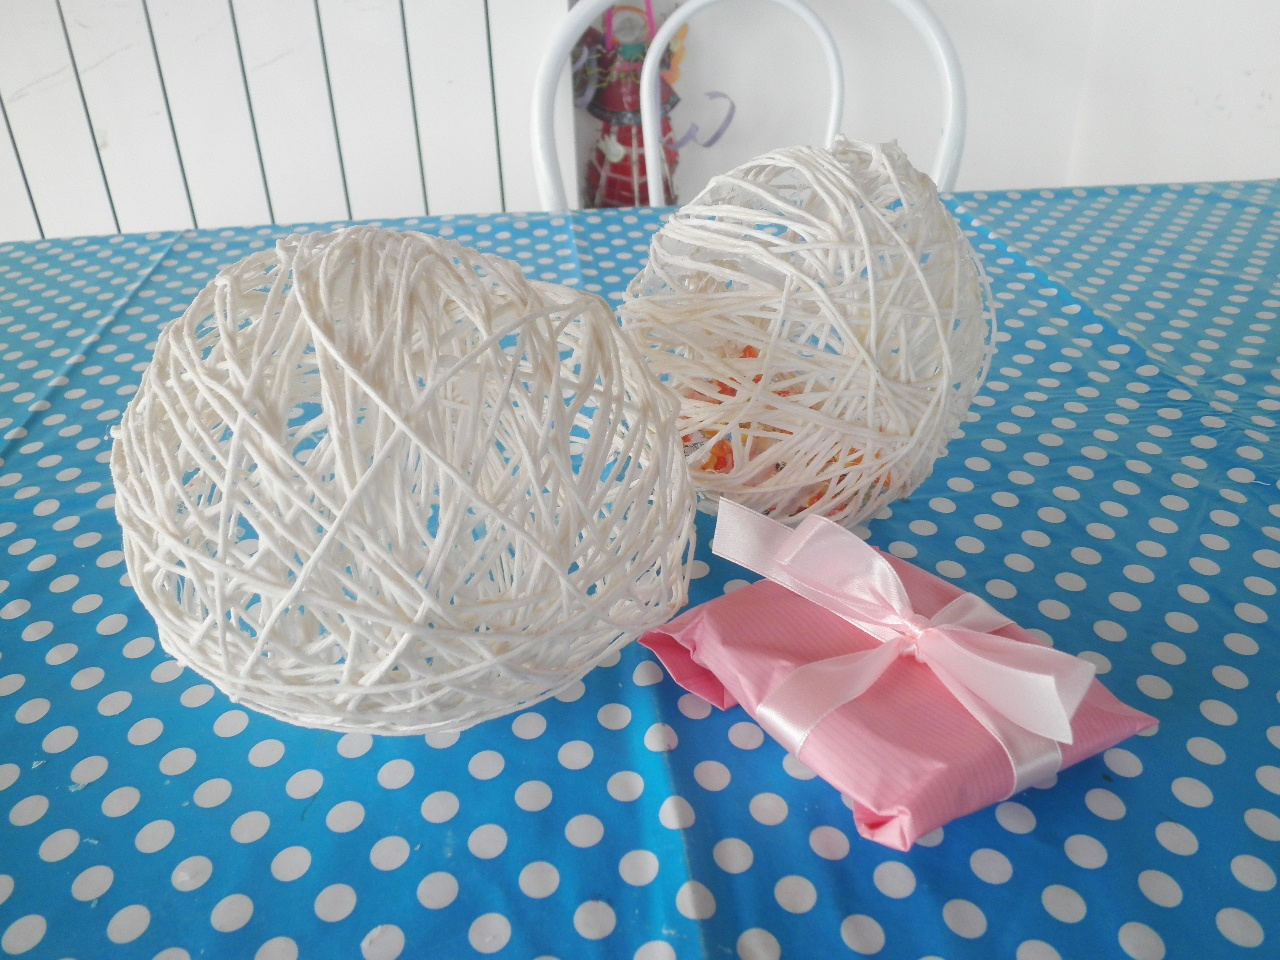 scoppia-i-palloncini